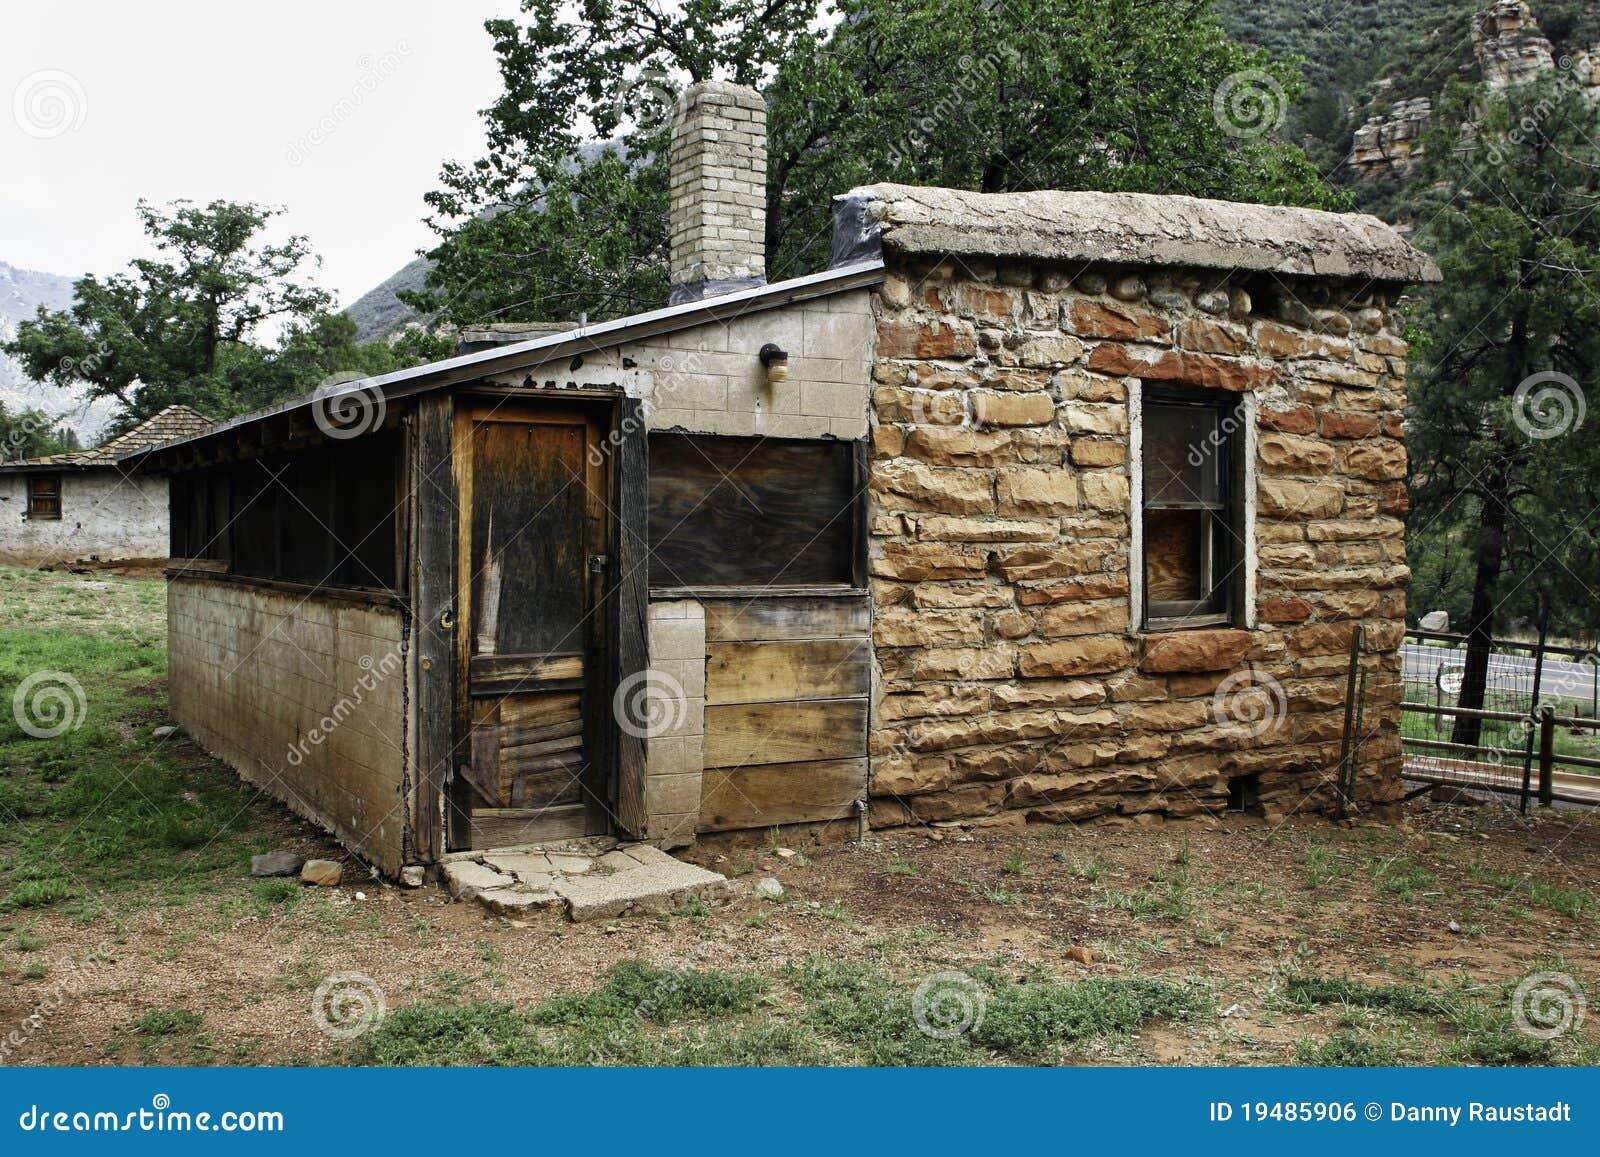 Abandoned Cabin In Arizona State Park Stock Photo Image